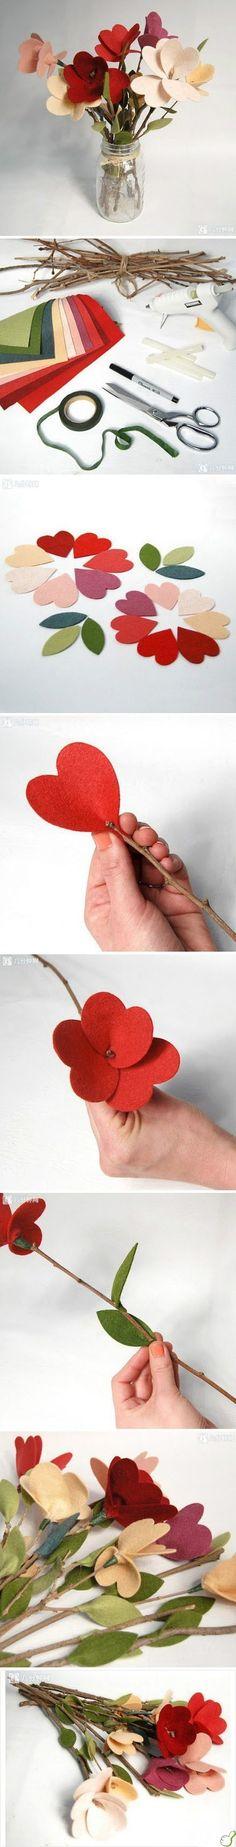 DIY ornamental flowers